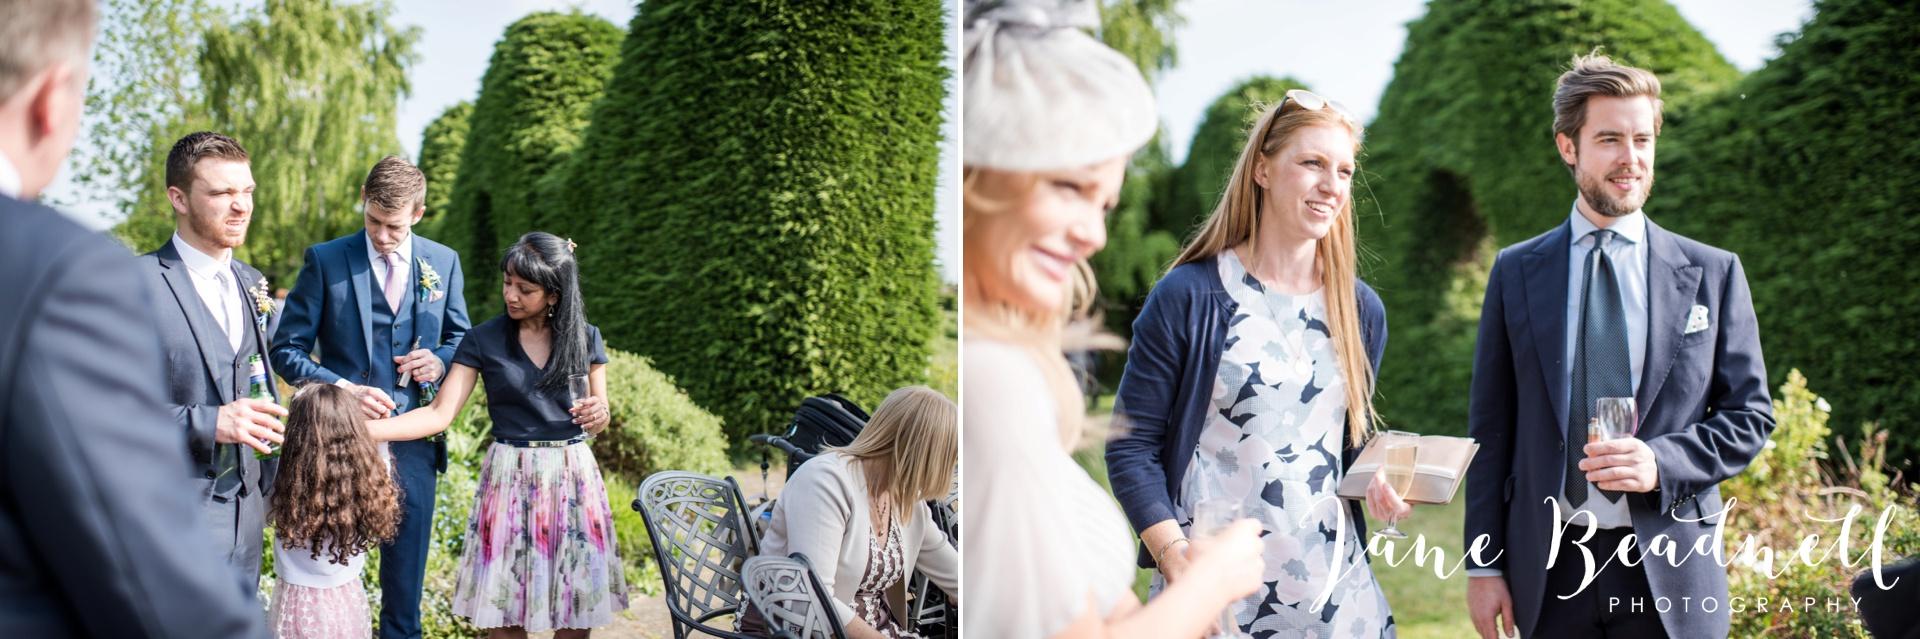 South Farm Wedding photography Hertfordshire by Jane Beadnell Photography fine art wedding photographer_0150